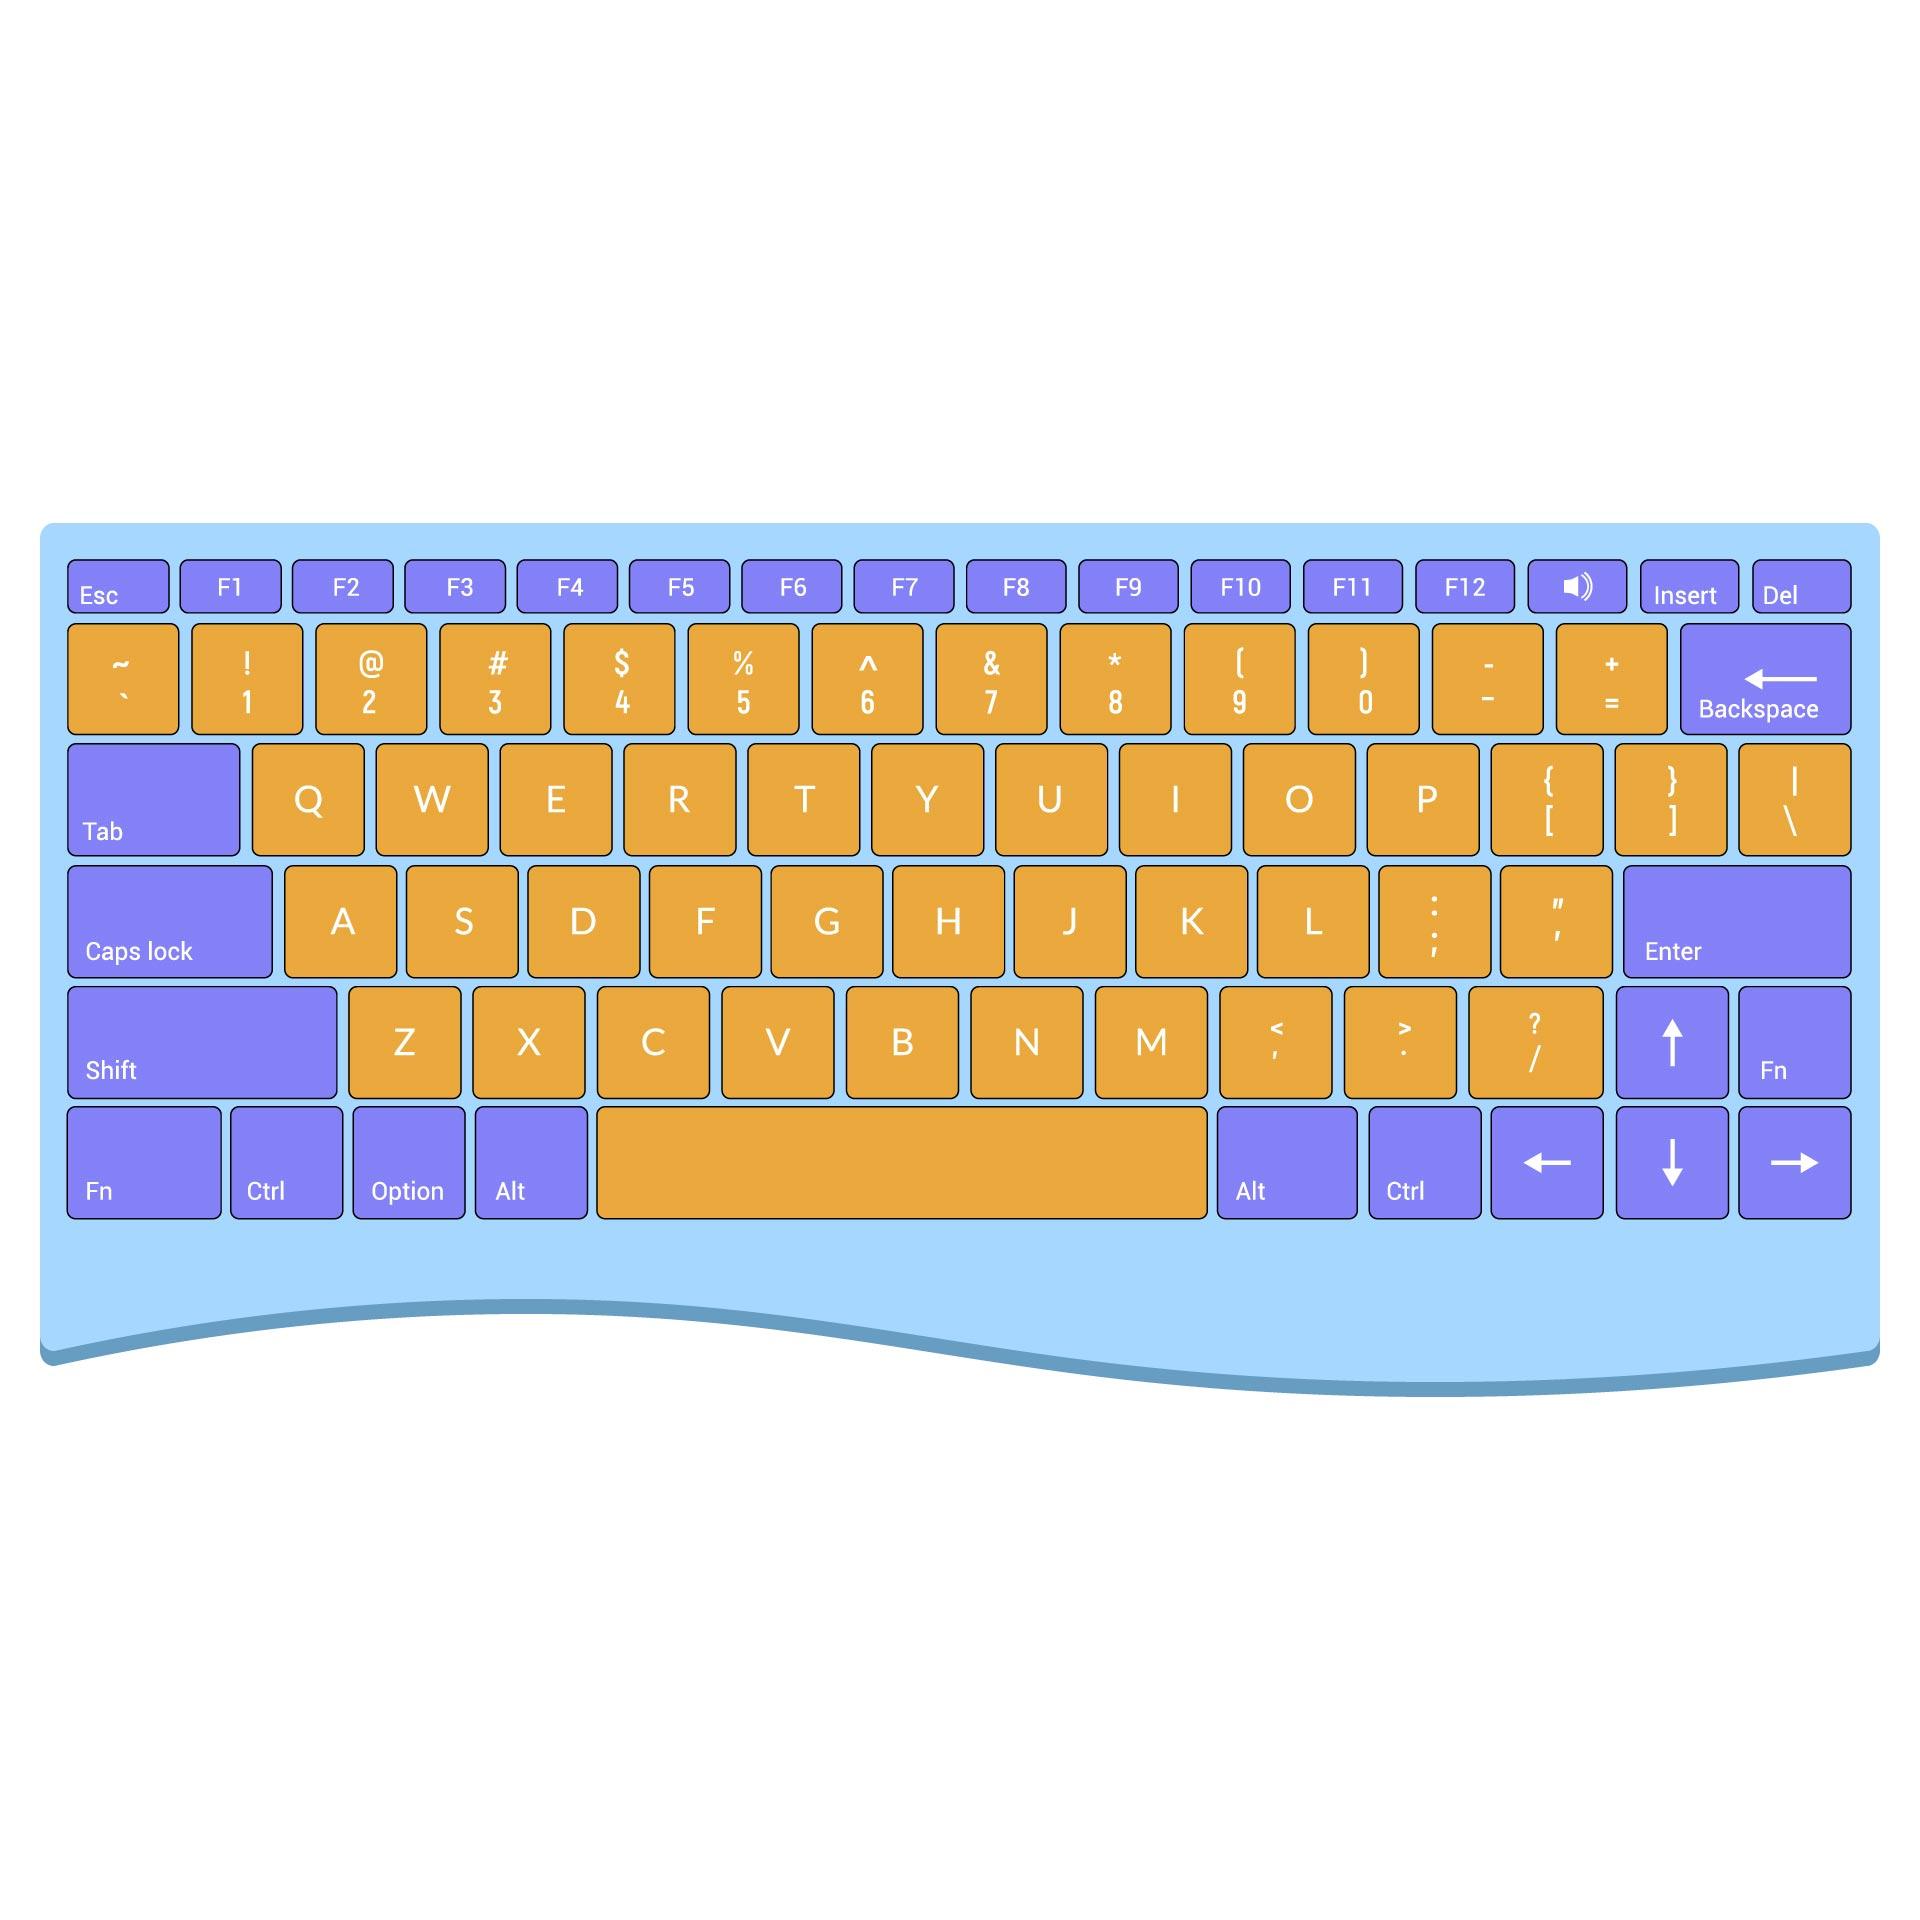 Printable Keyboard Layout Template